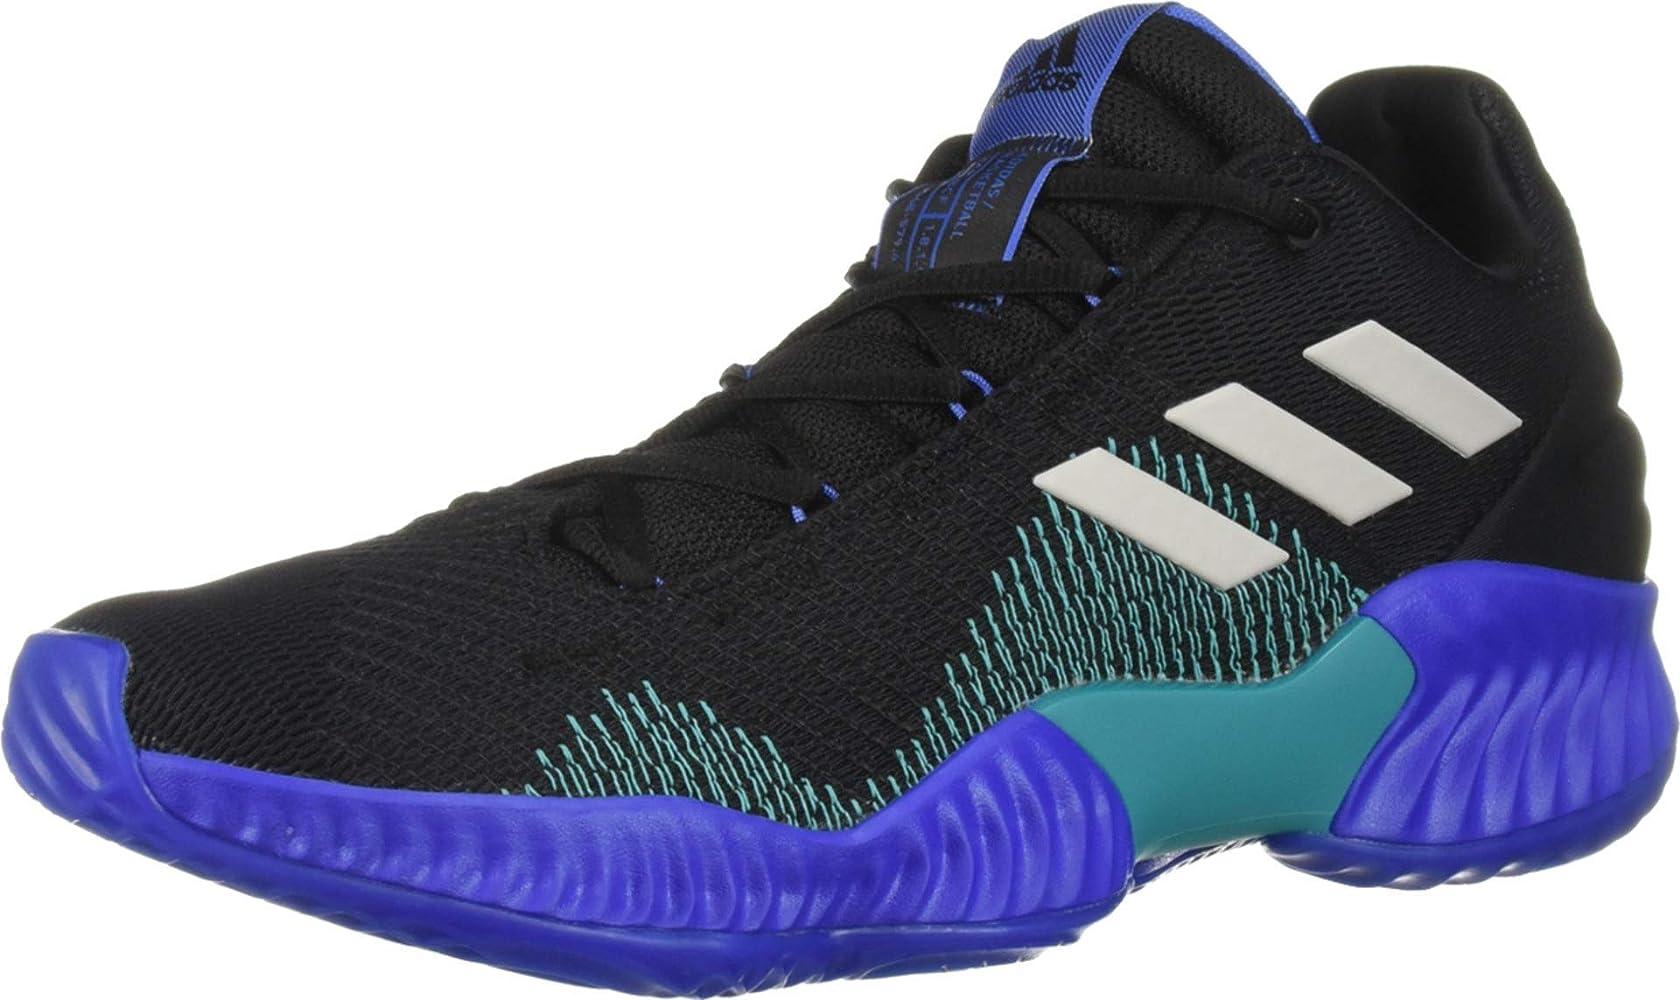 Pro Bounce 2018 Low Basketball Shoe